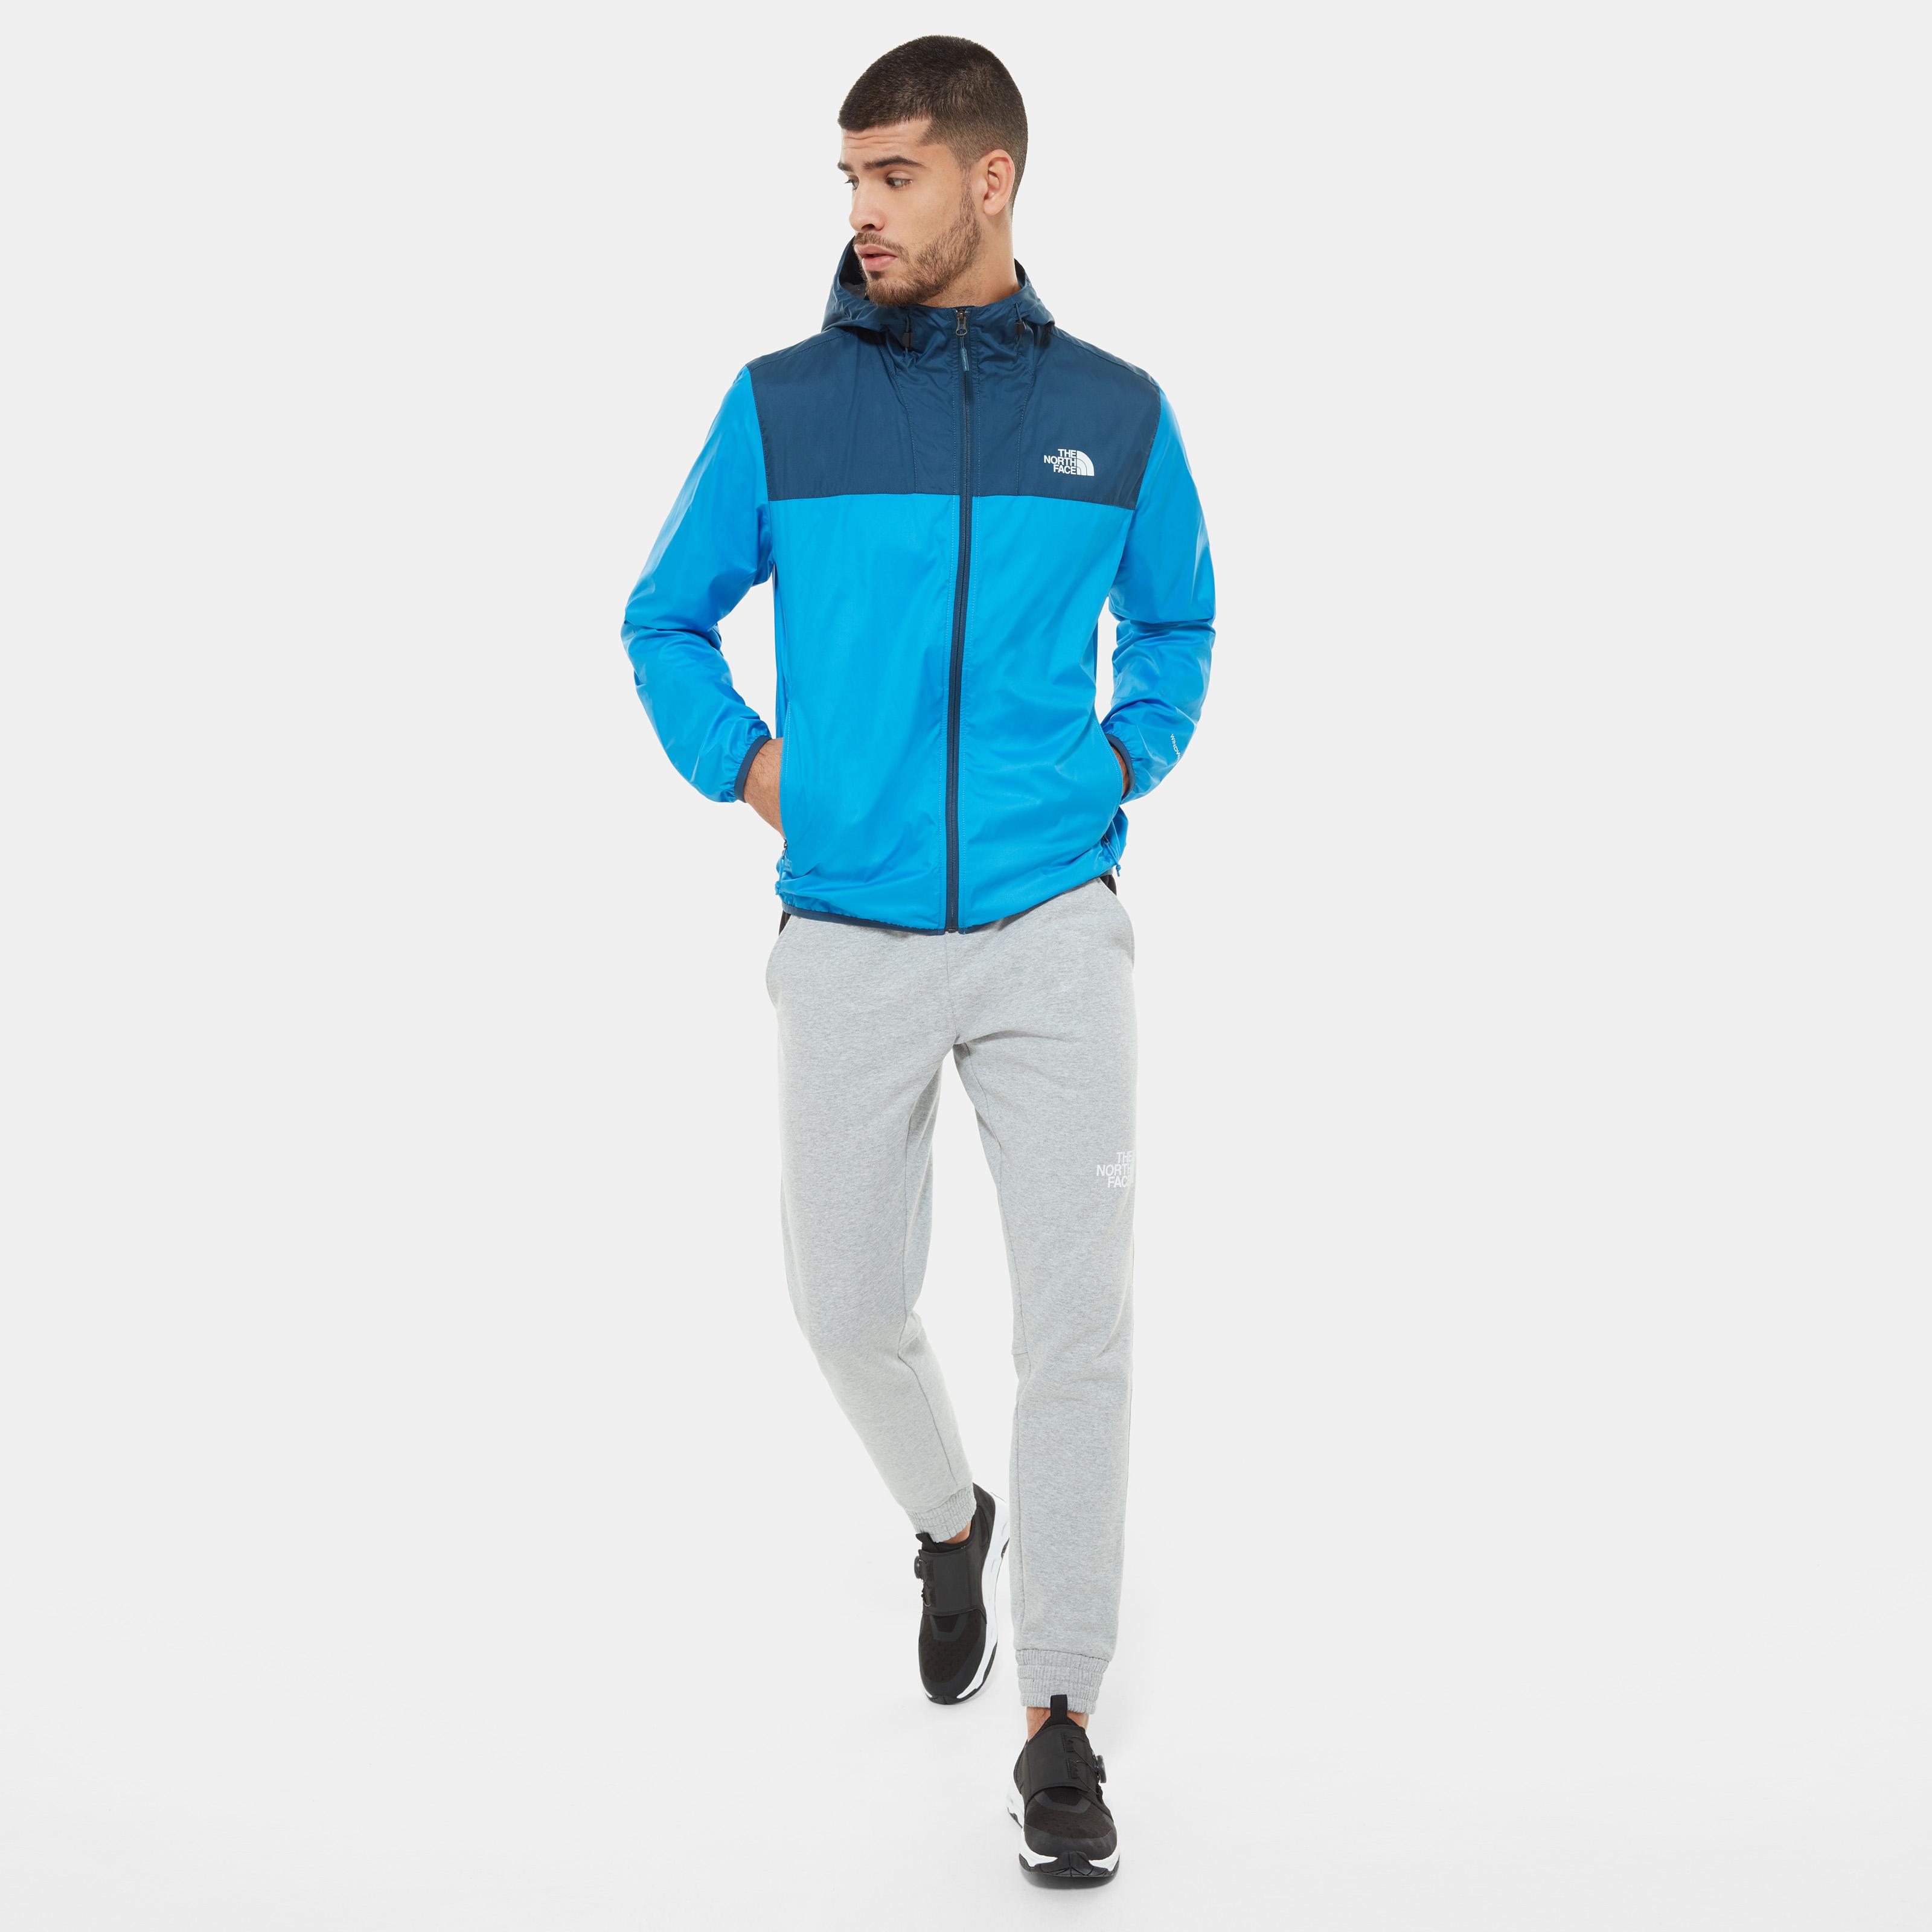 Мужская куртка с капюшоном Cyclone II Hooded Jacket фото